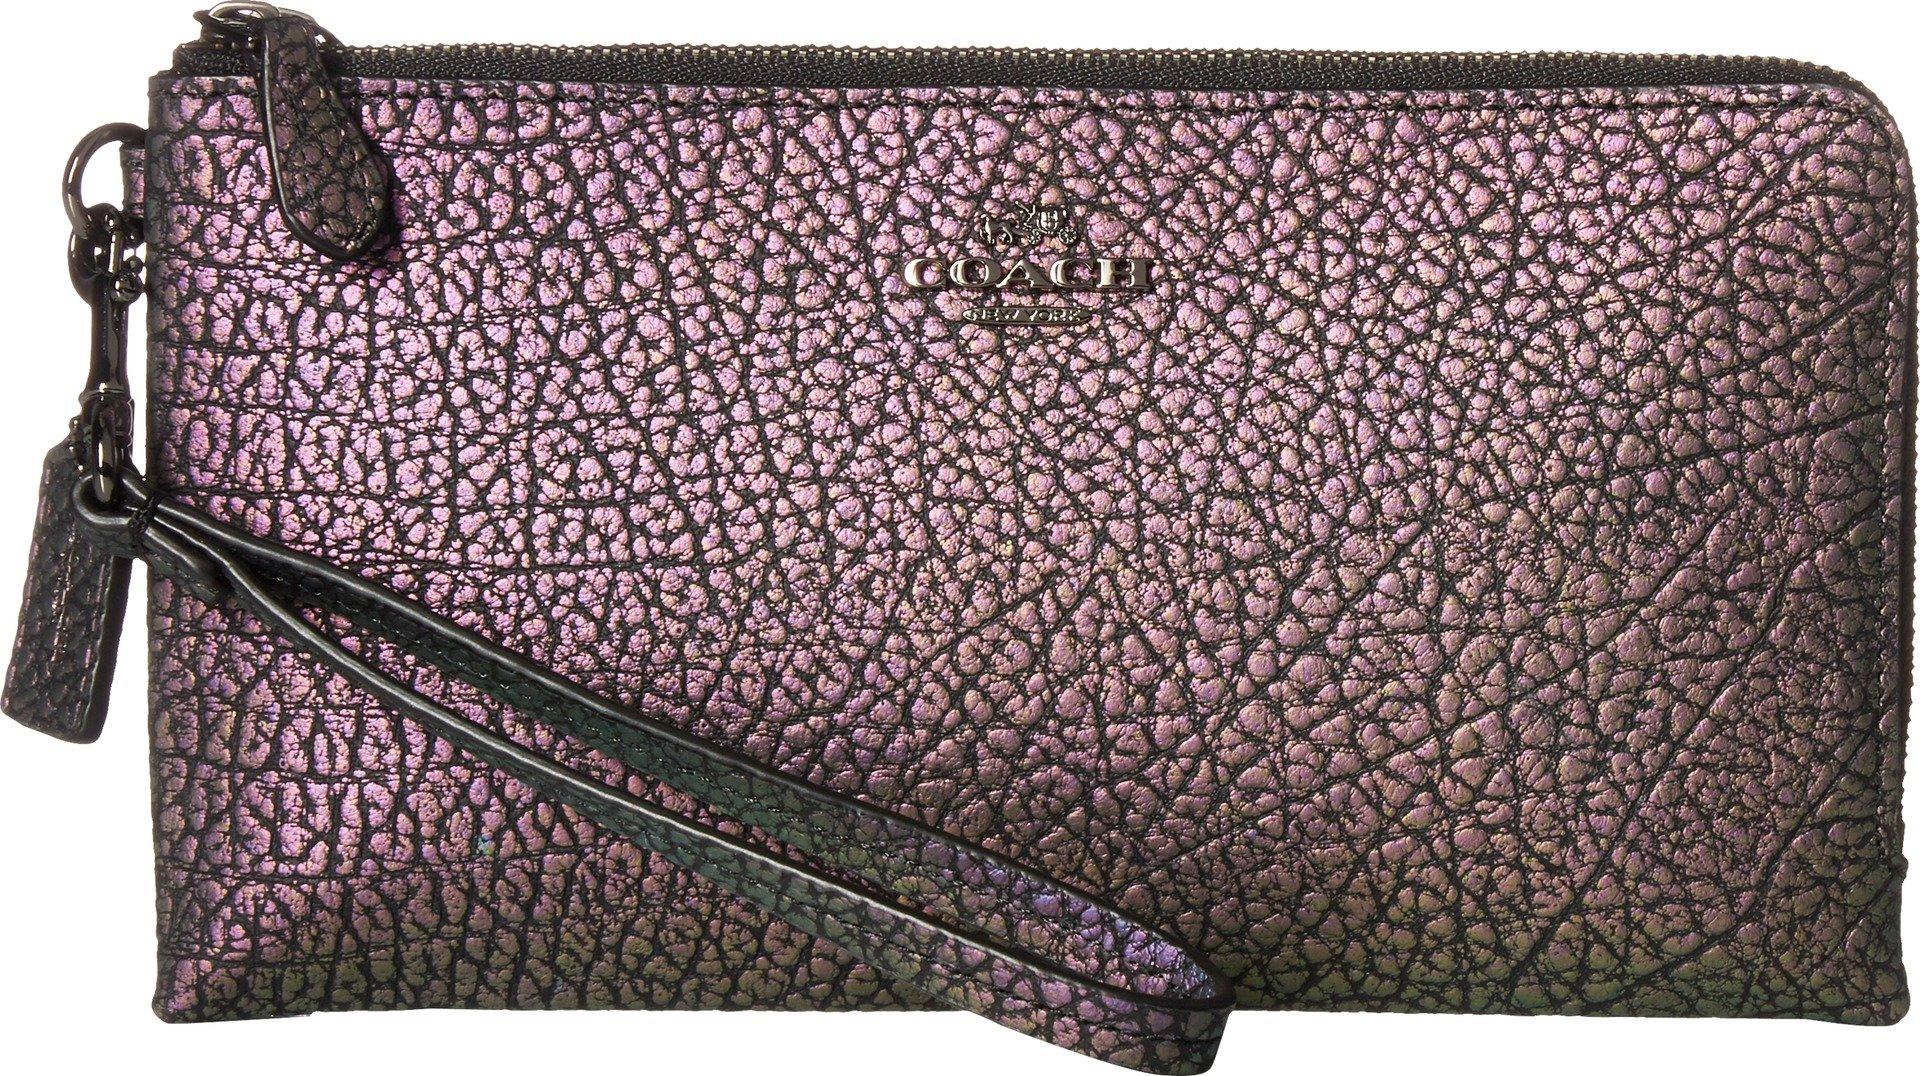 COACH Women's Pebbled Leather Double Zip Wallet Dk/Hologram One Size